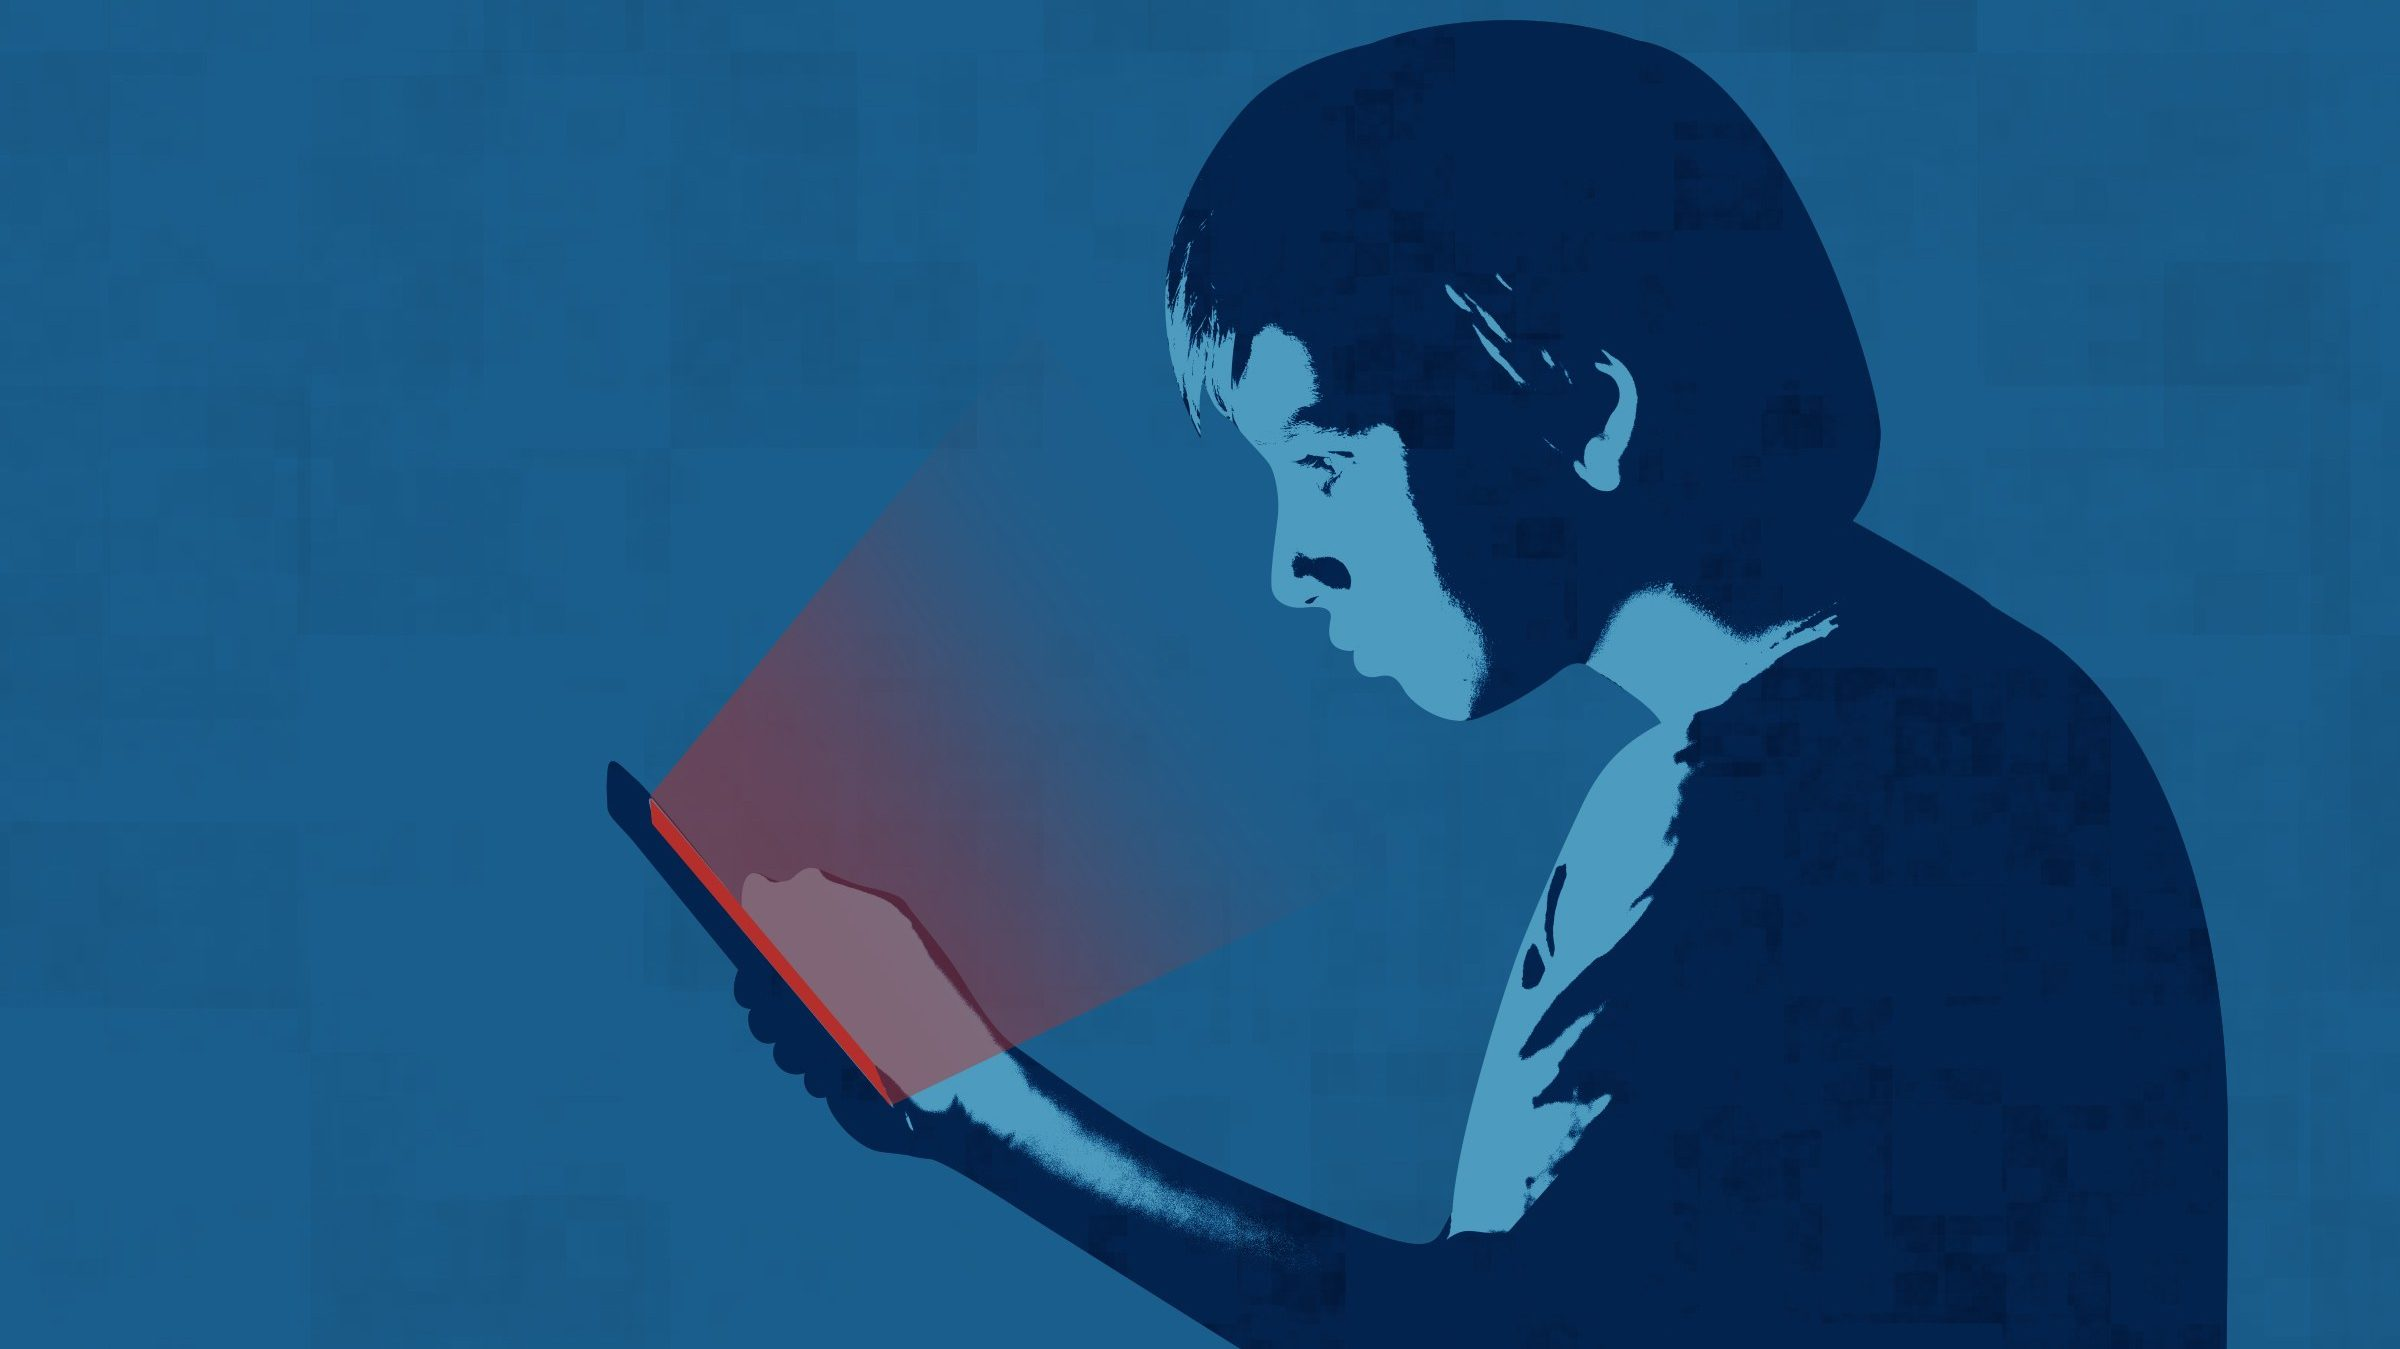 Il cyberbullismo